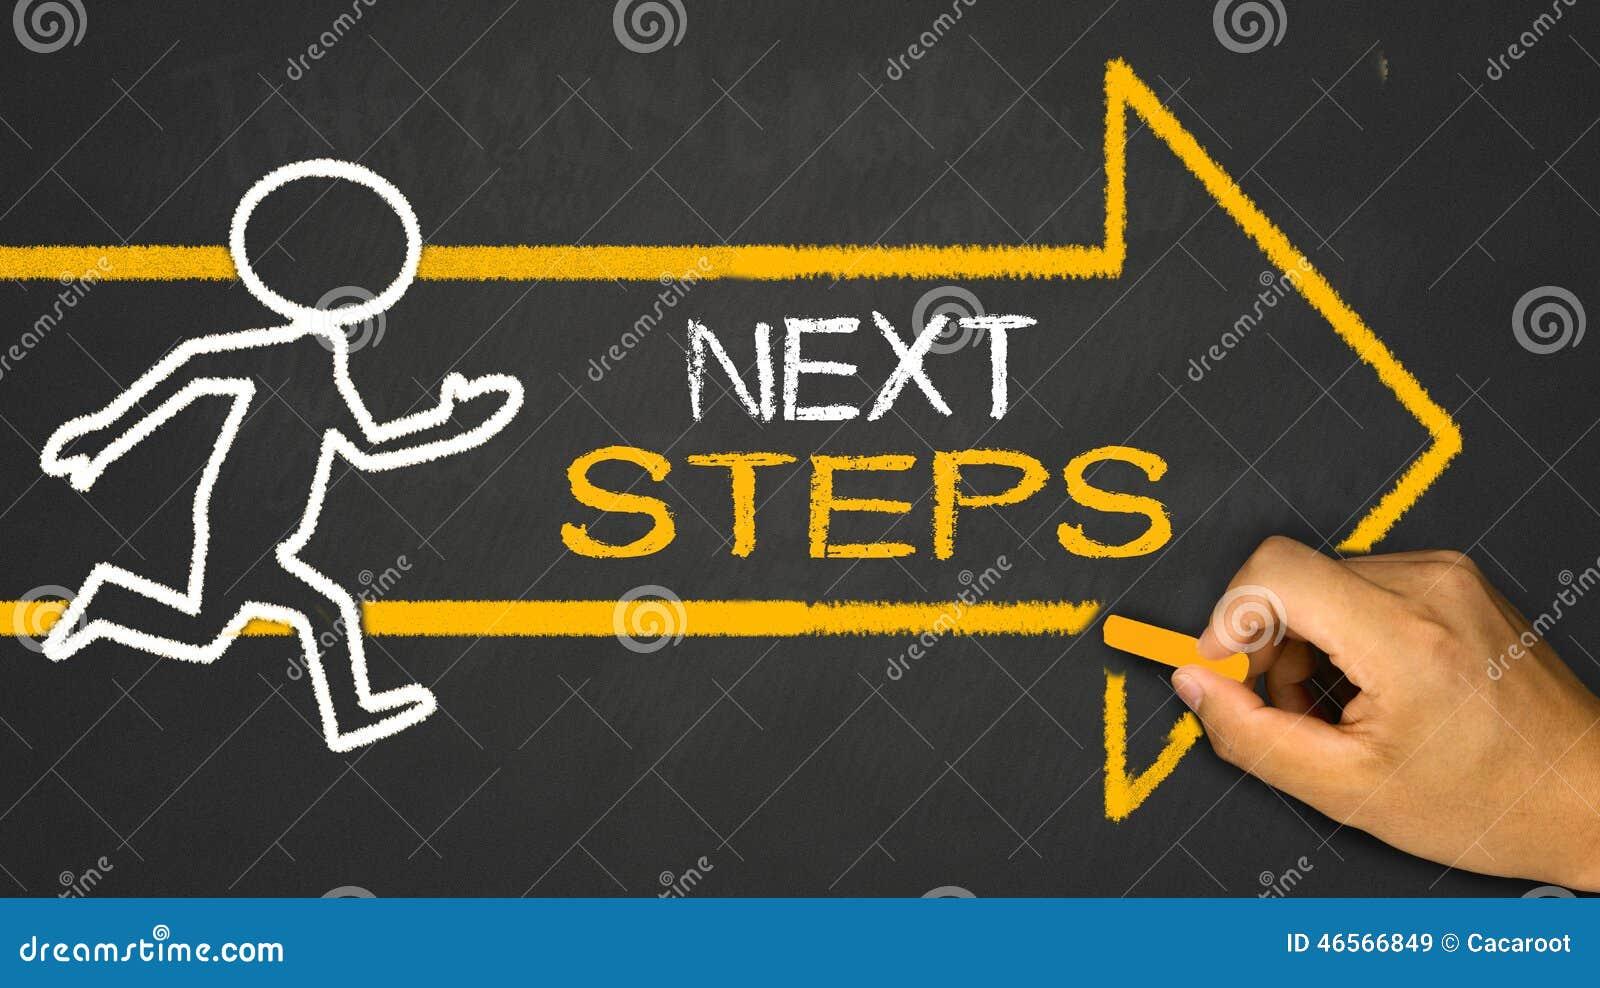 Next Steps Concept Stock Photo Image 46566849